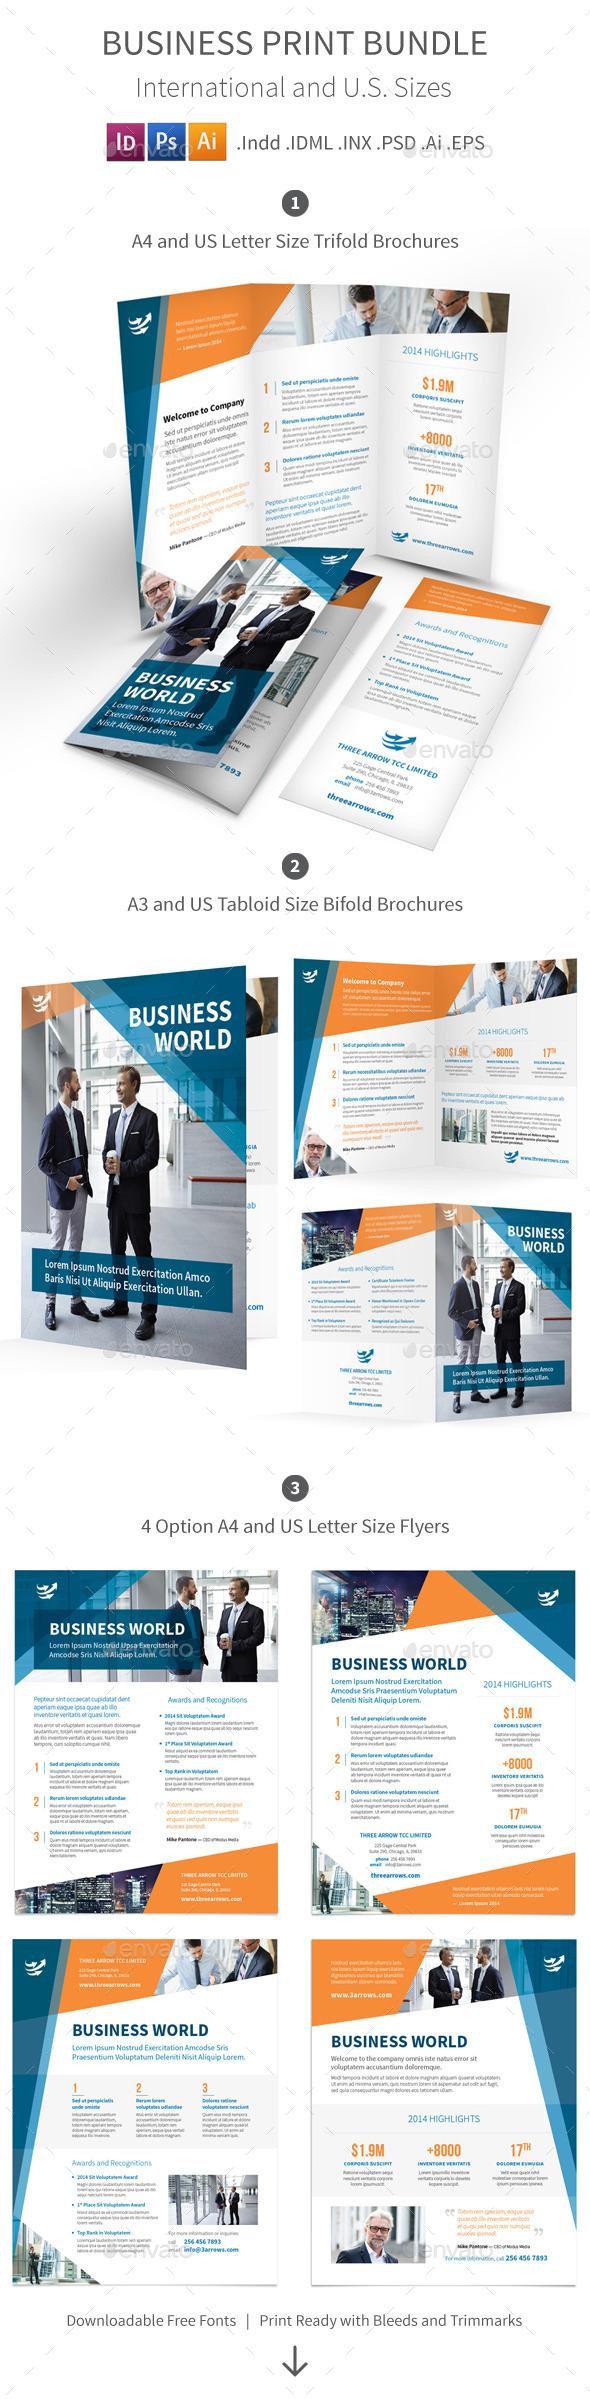 Business Print Bundle - Informational Brochures